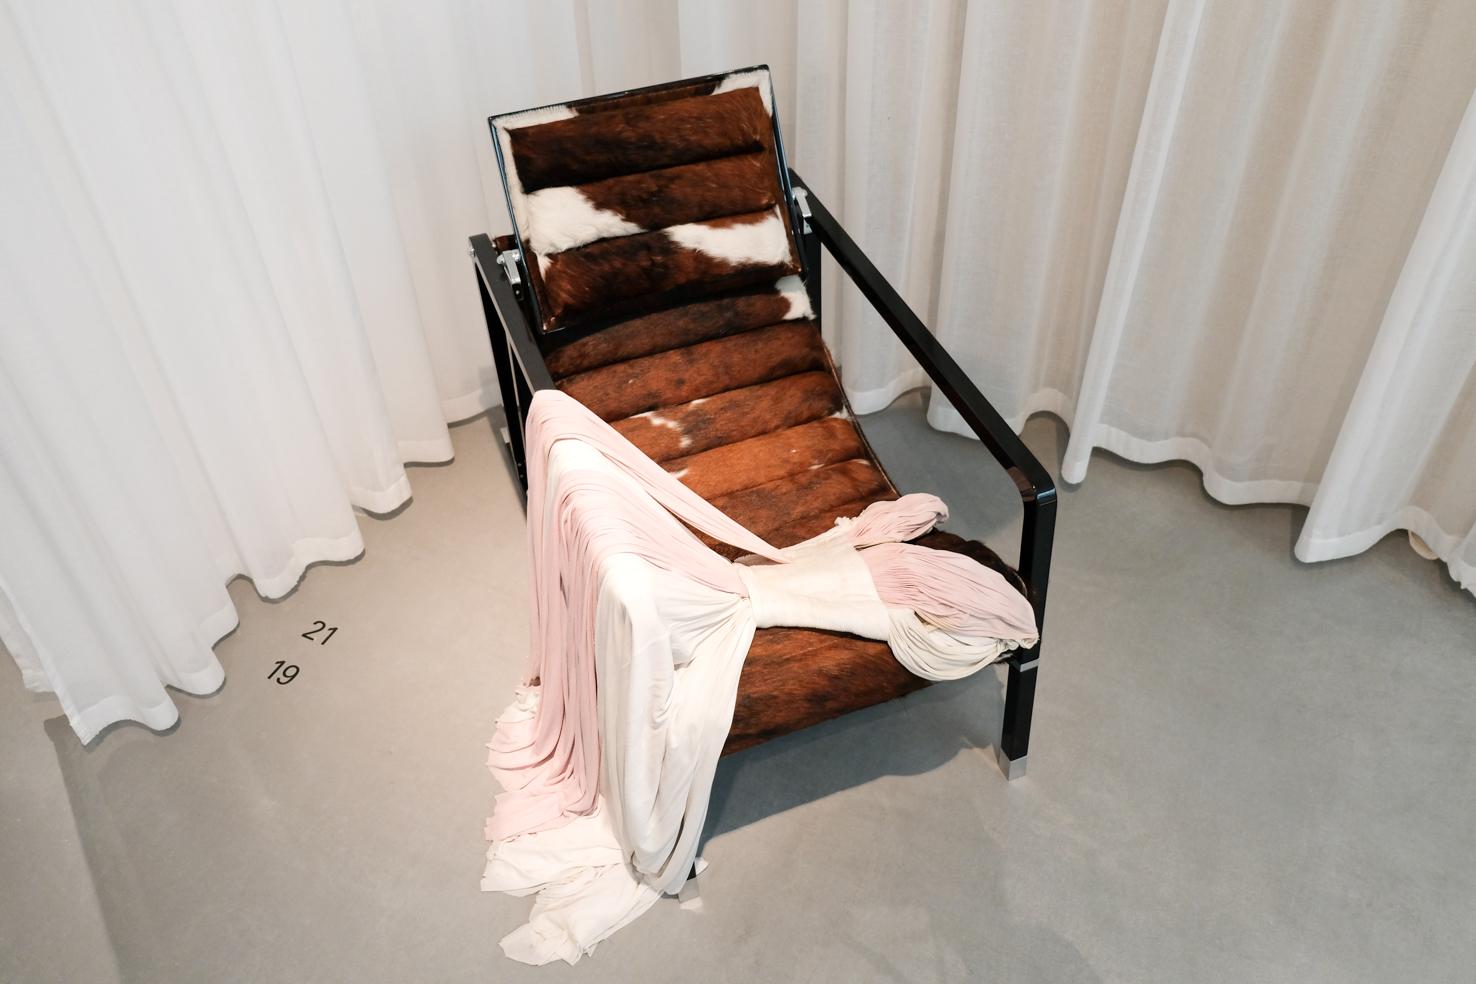 27 Madame Gres Gown 1955 Eoleen Gray Transat Chair 1926